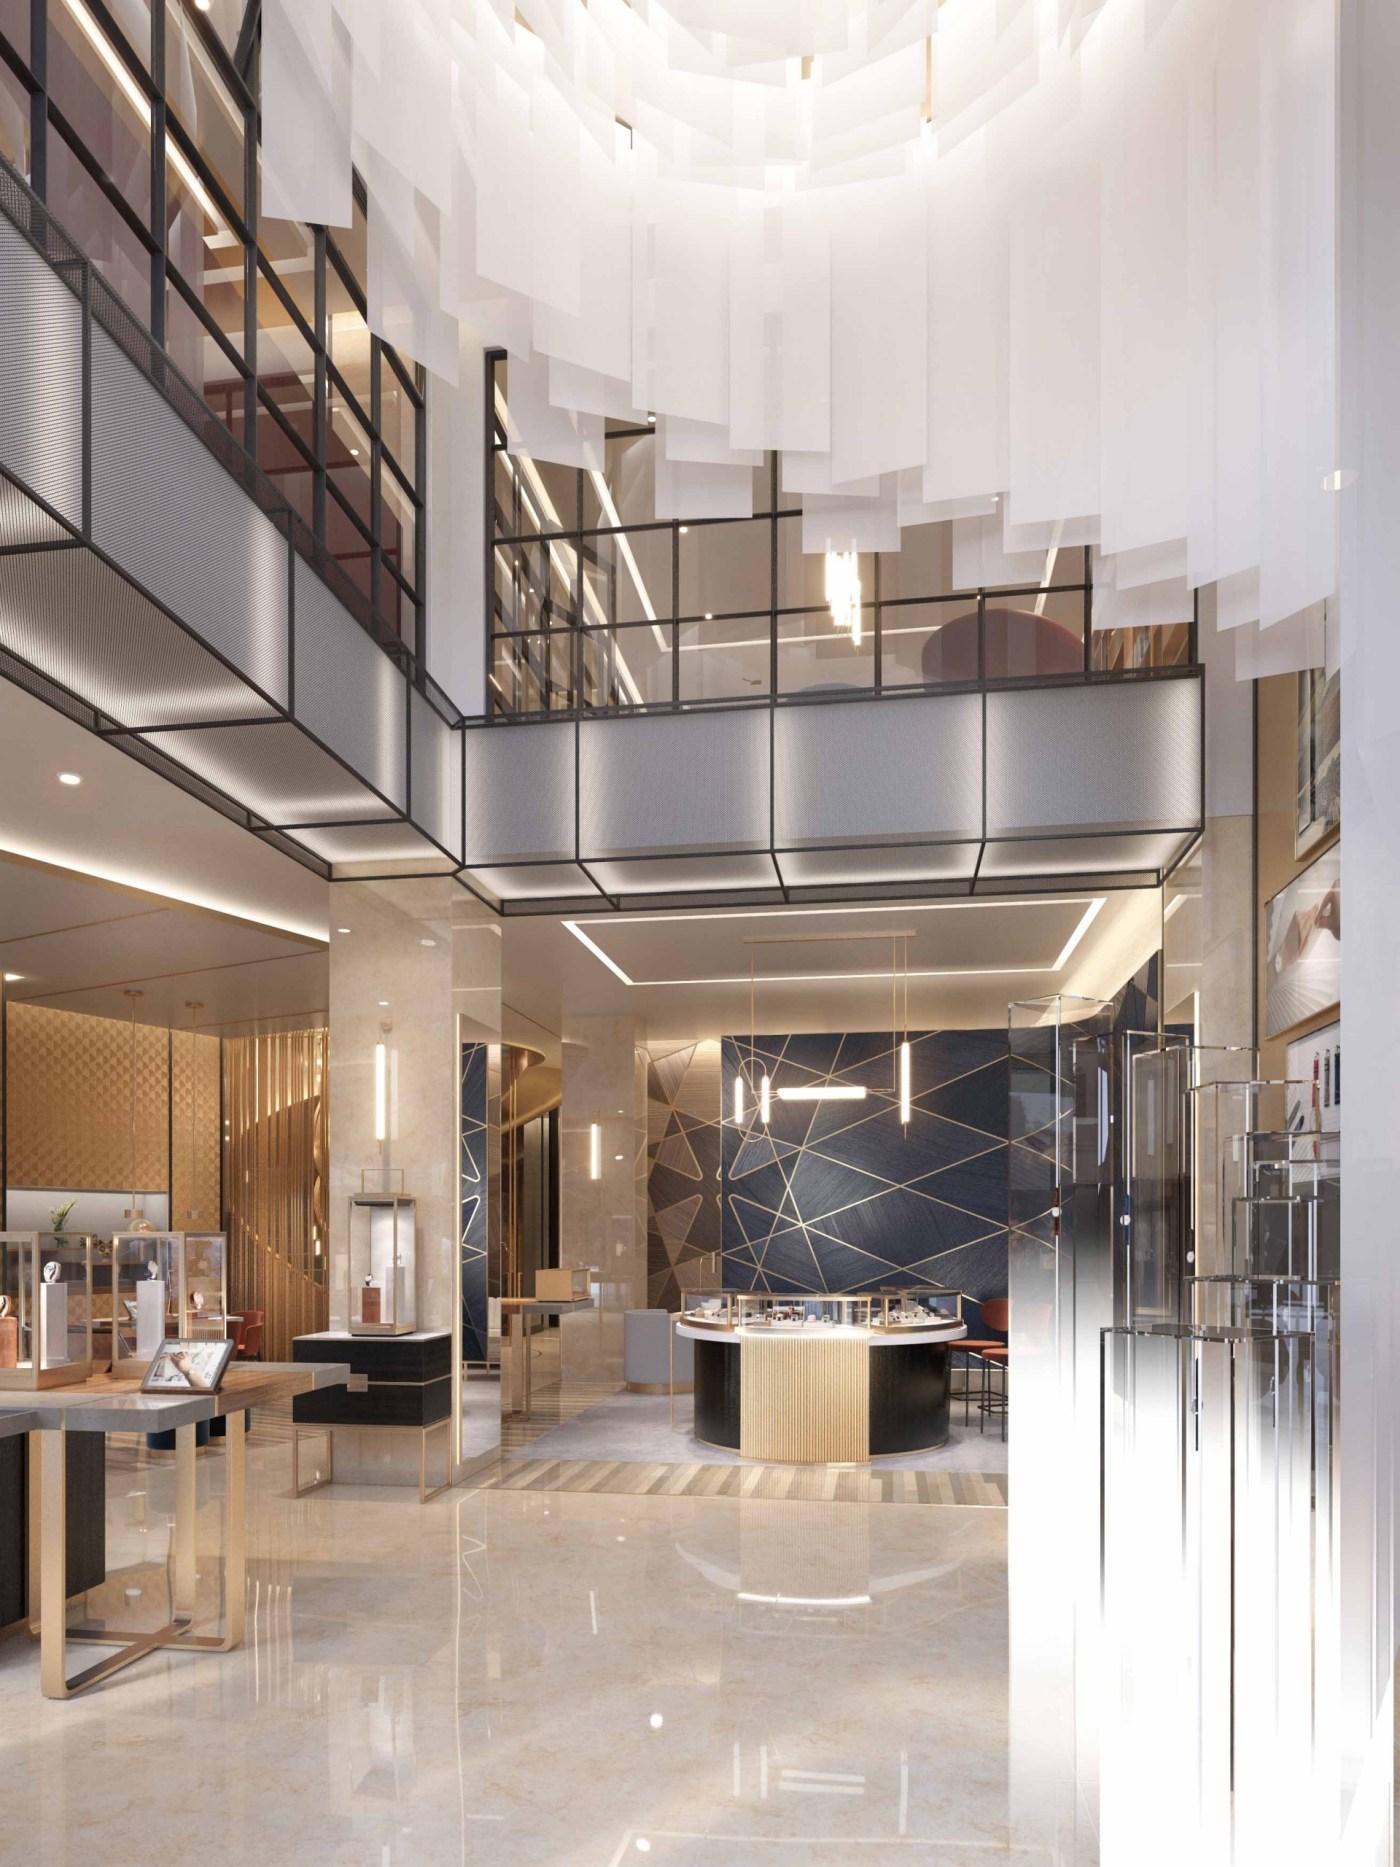 Vacheron Constantin NYC Flagship 2021 - Atrium